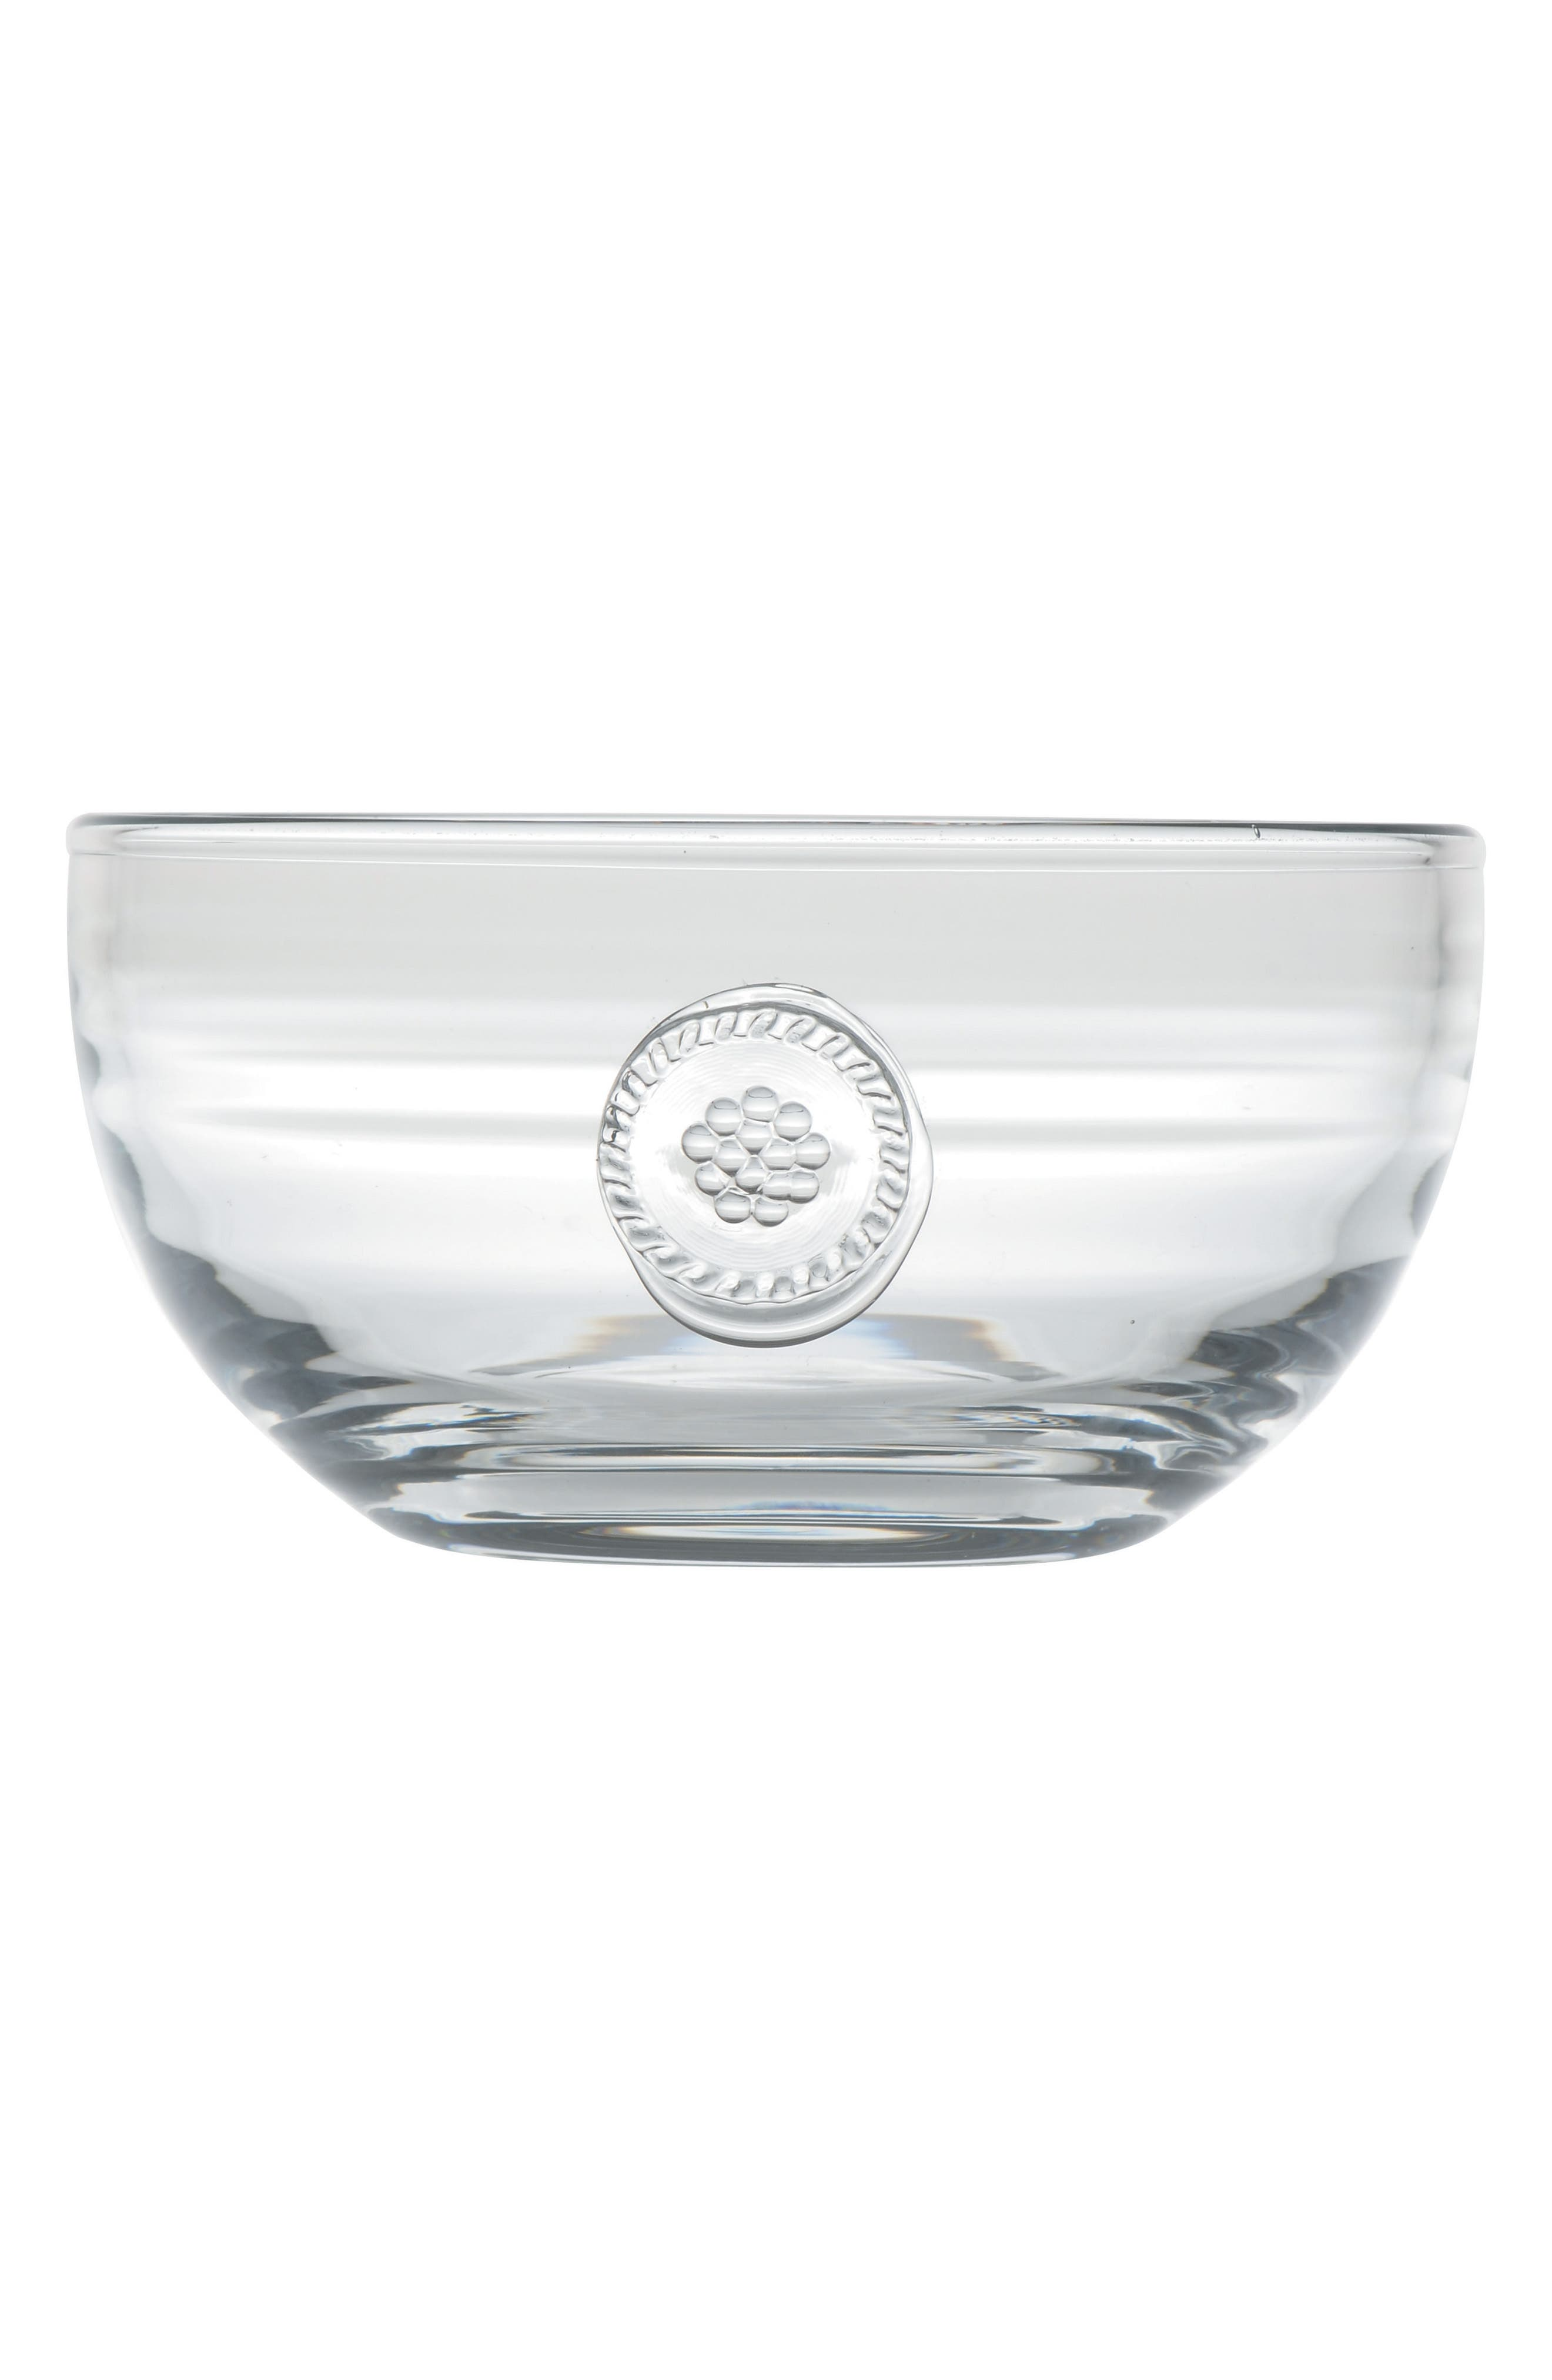 Juliska Berry & Thread Small Glass Bowl